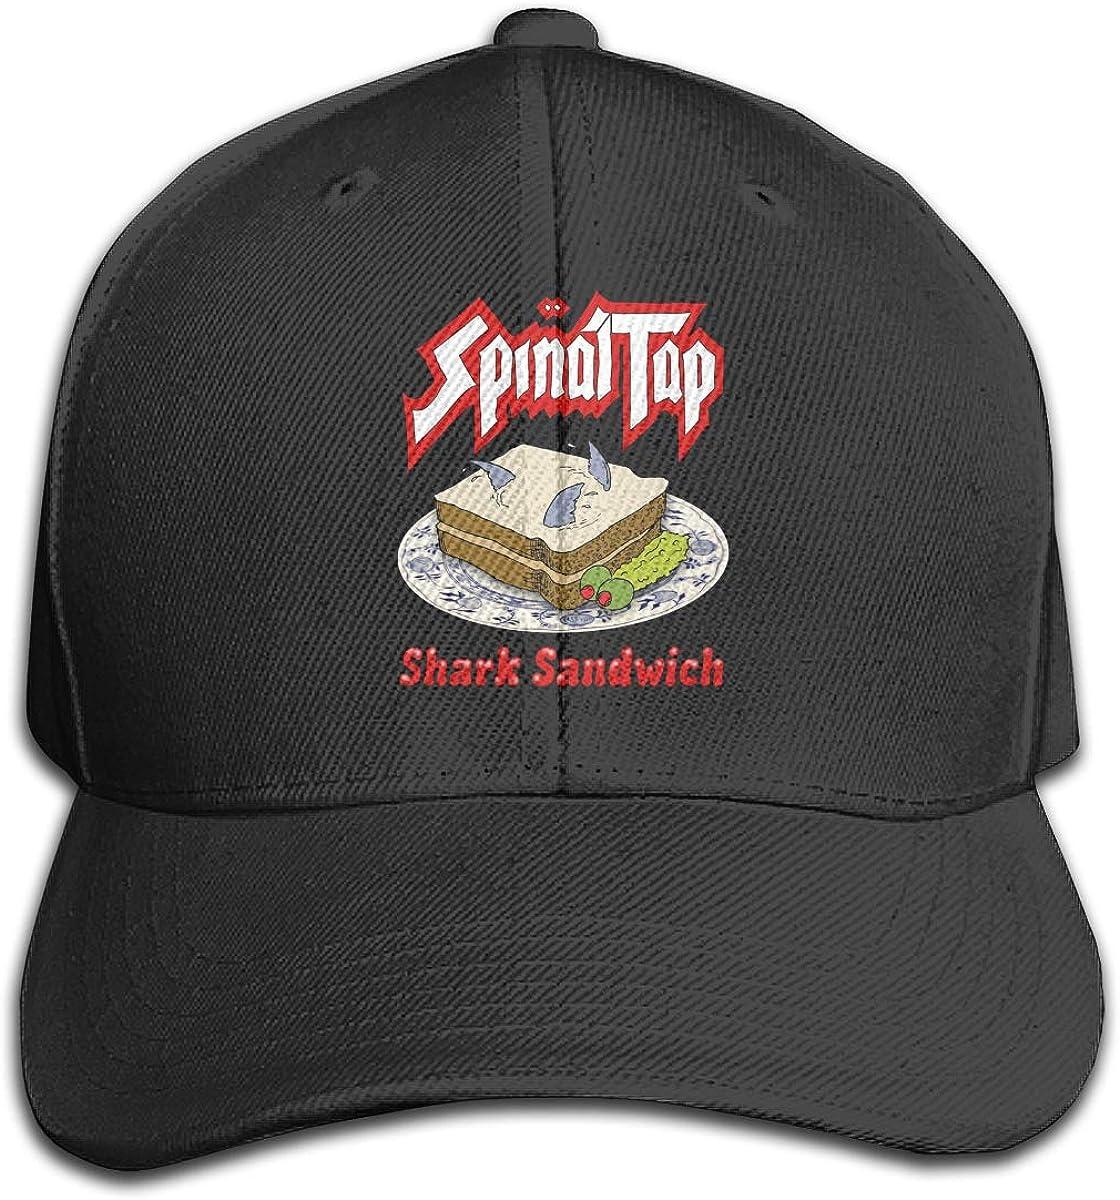 Iasiti American Team Adjustable Baseball Hat Mens Sports Fit Cap Women